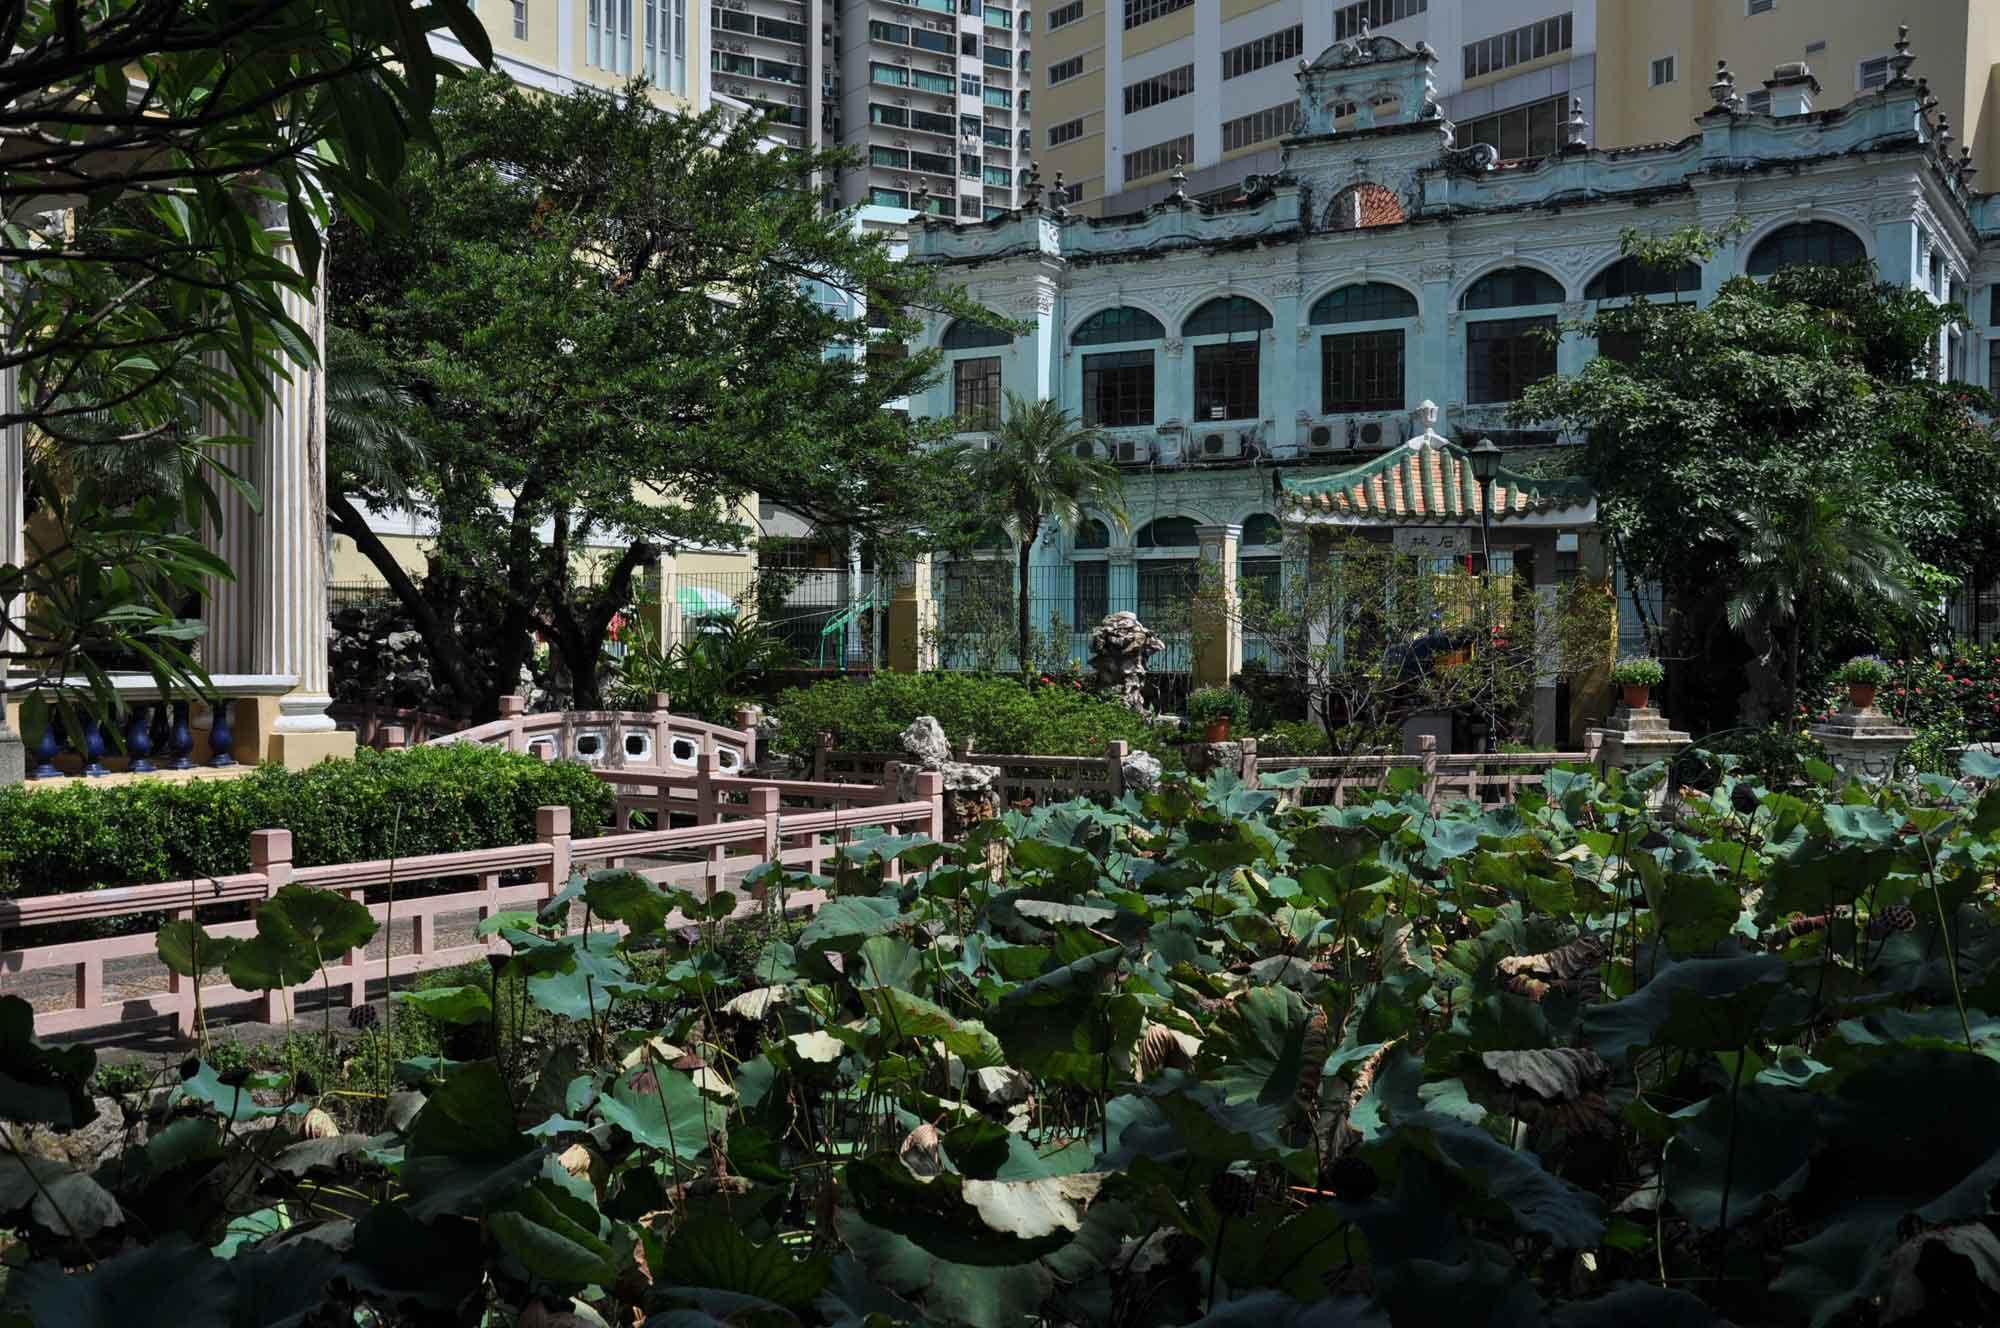 Lou Lim Ieoc Garden bridge and old house